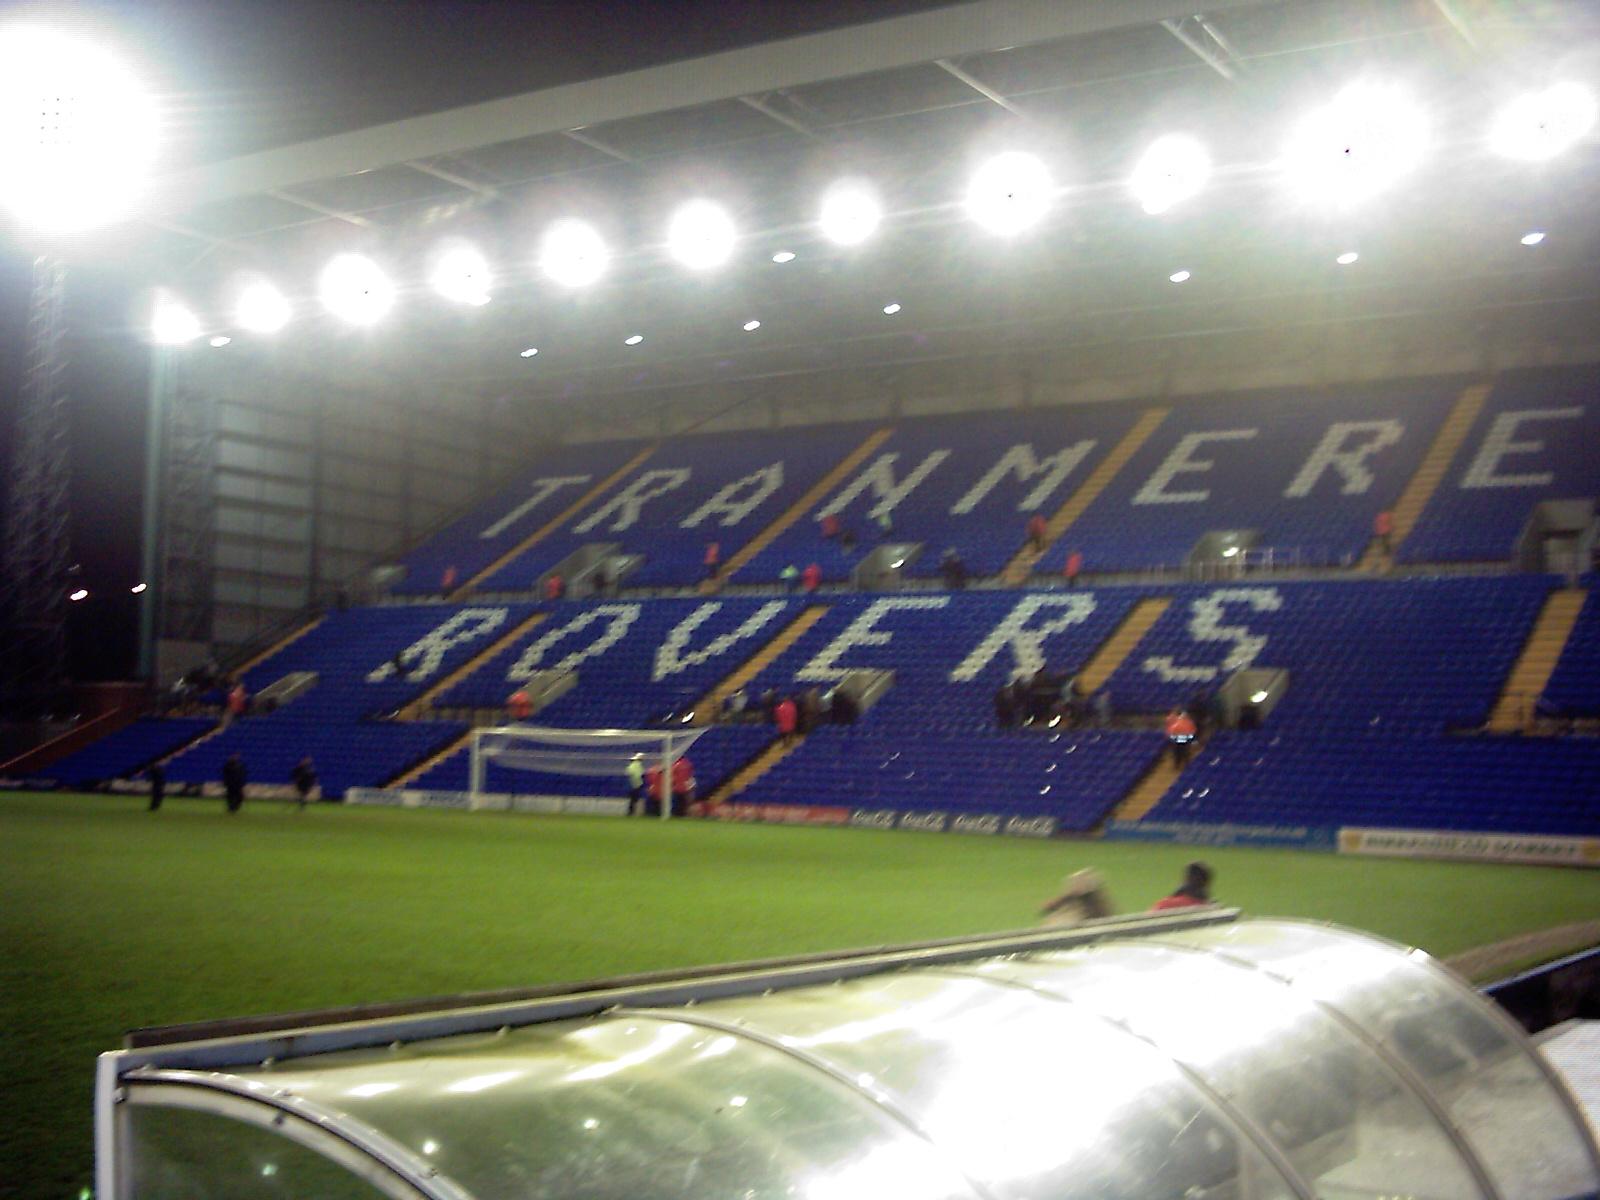 Stadium - Tranmere Rovers (Night)